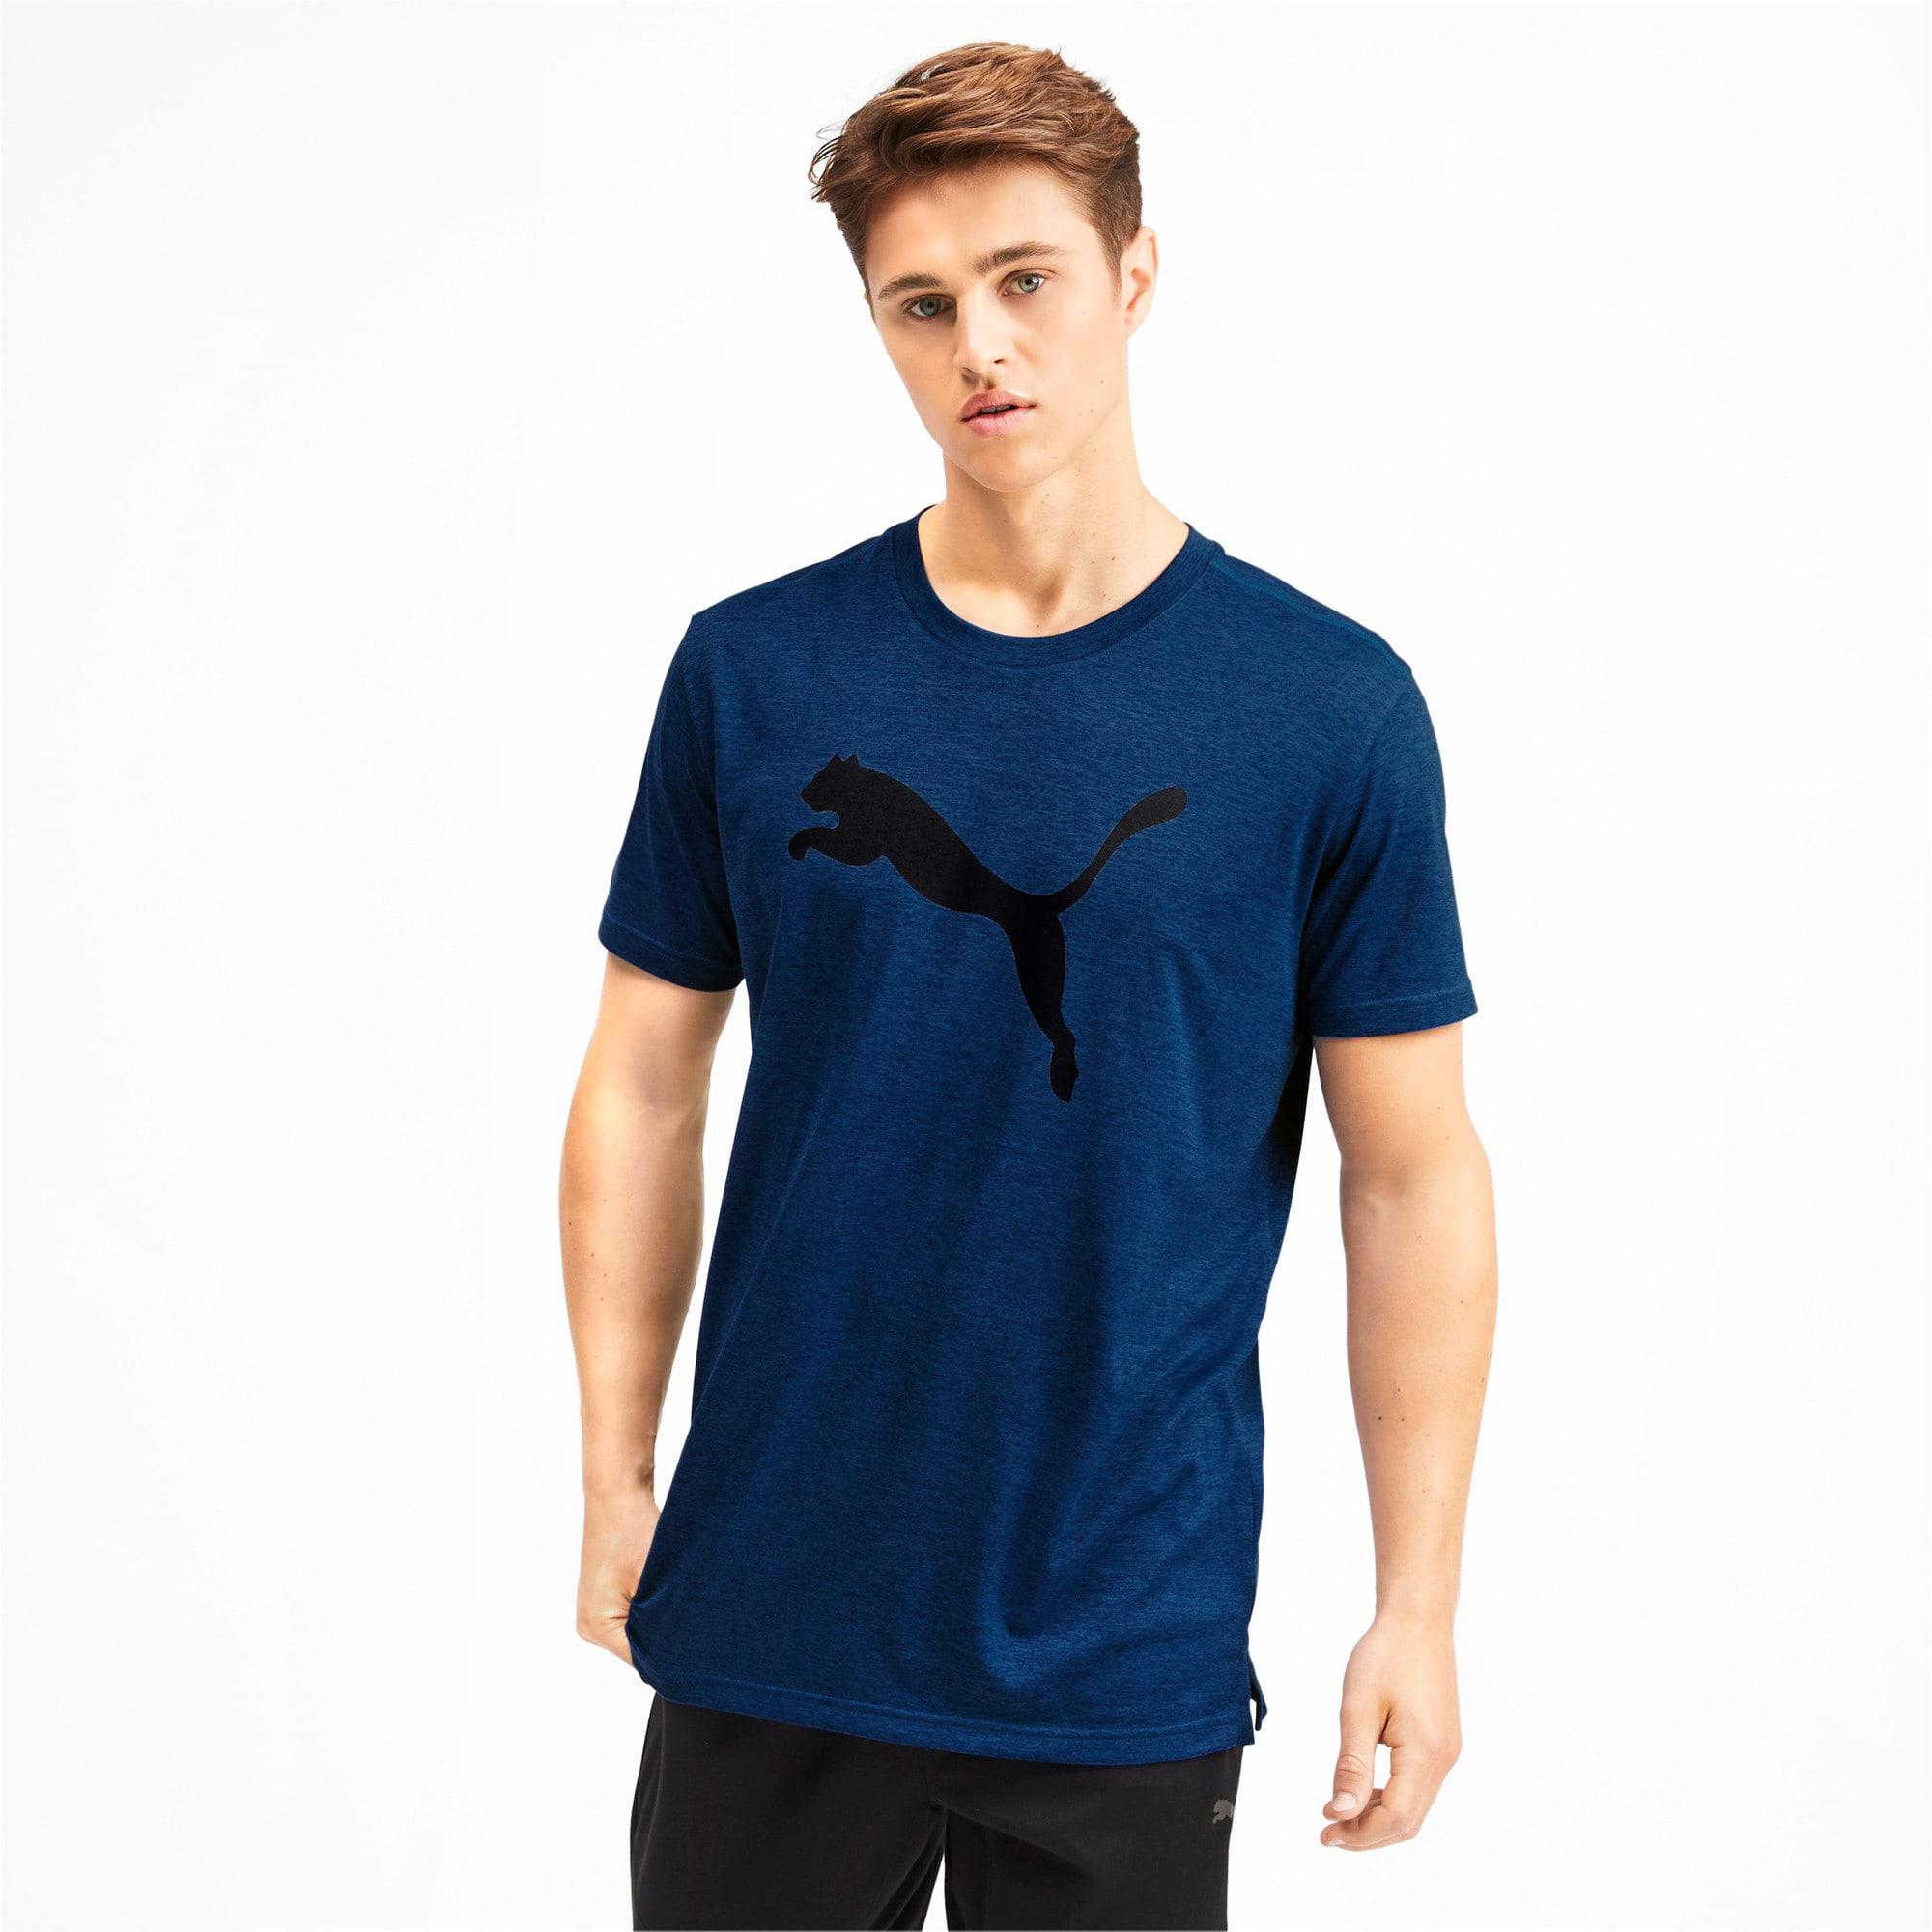 Thumbnail 1 of Heather Cat Herren Training T-Shirt, Galaxy Blue Heather, medium